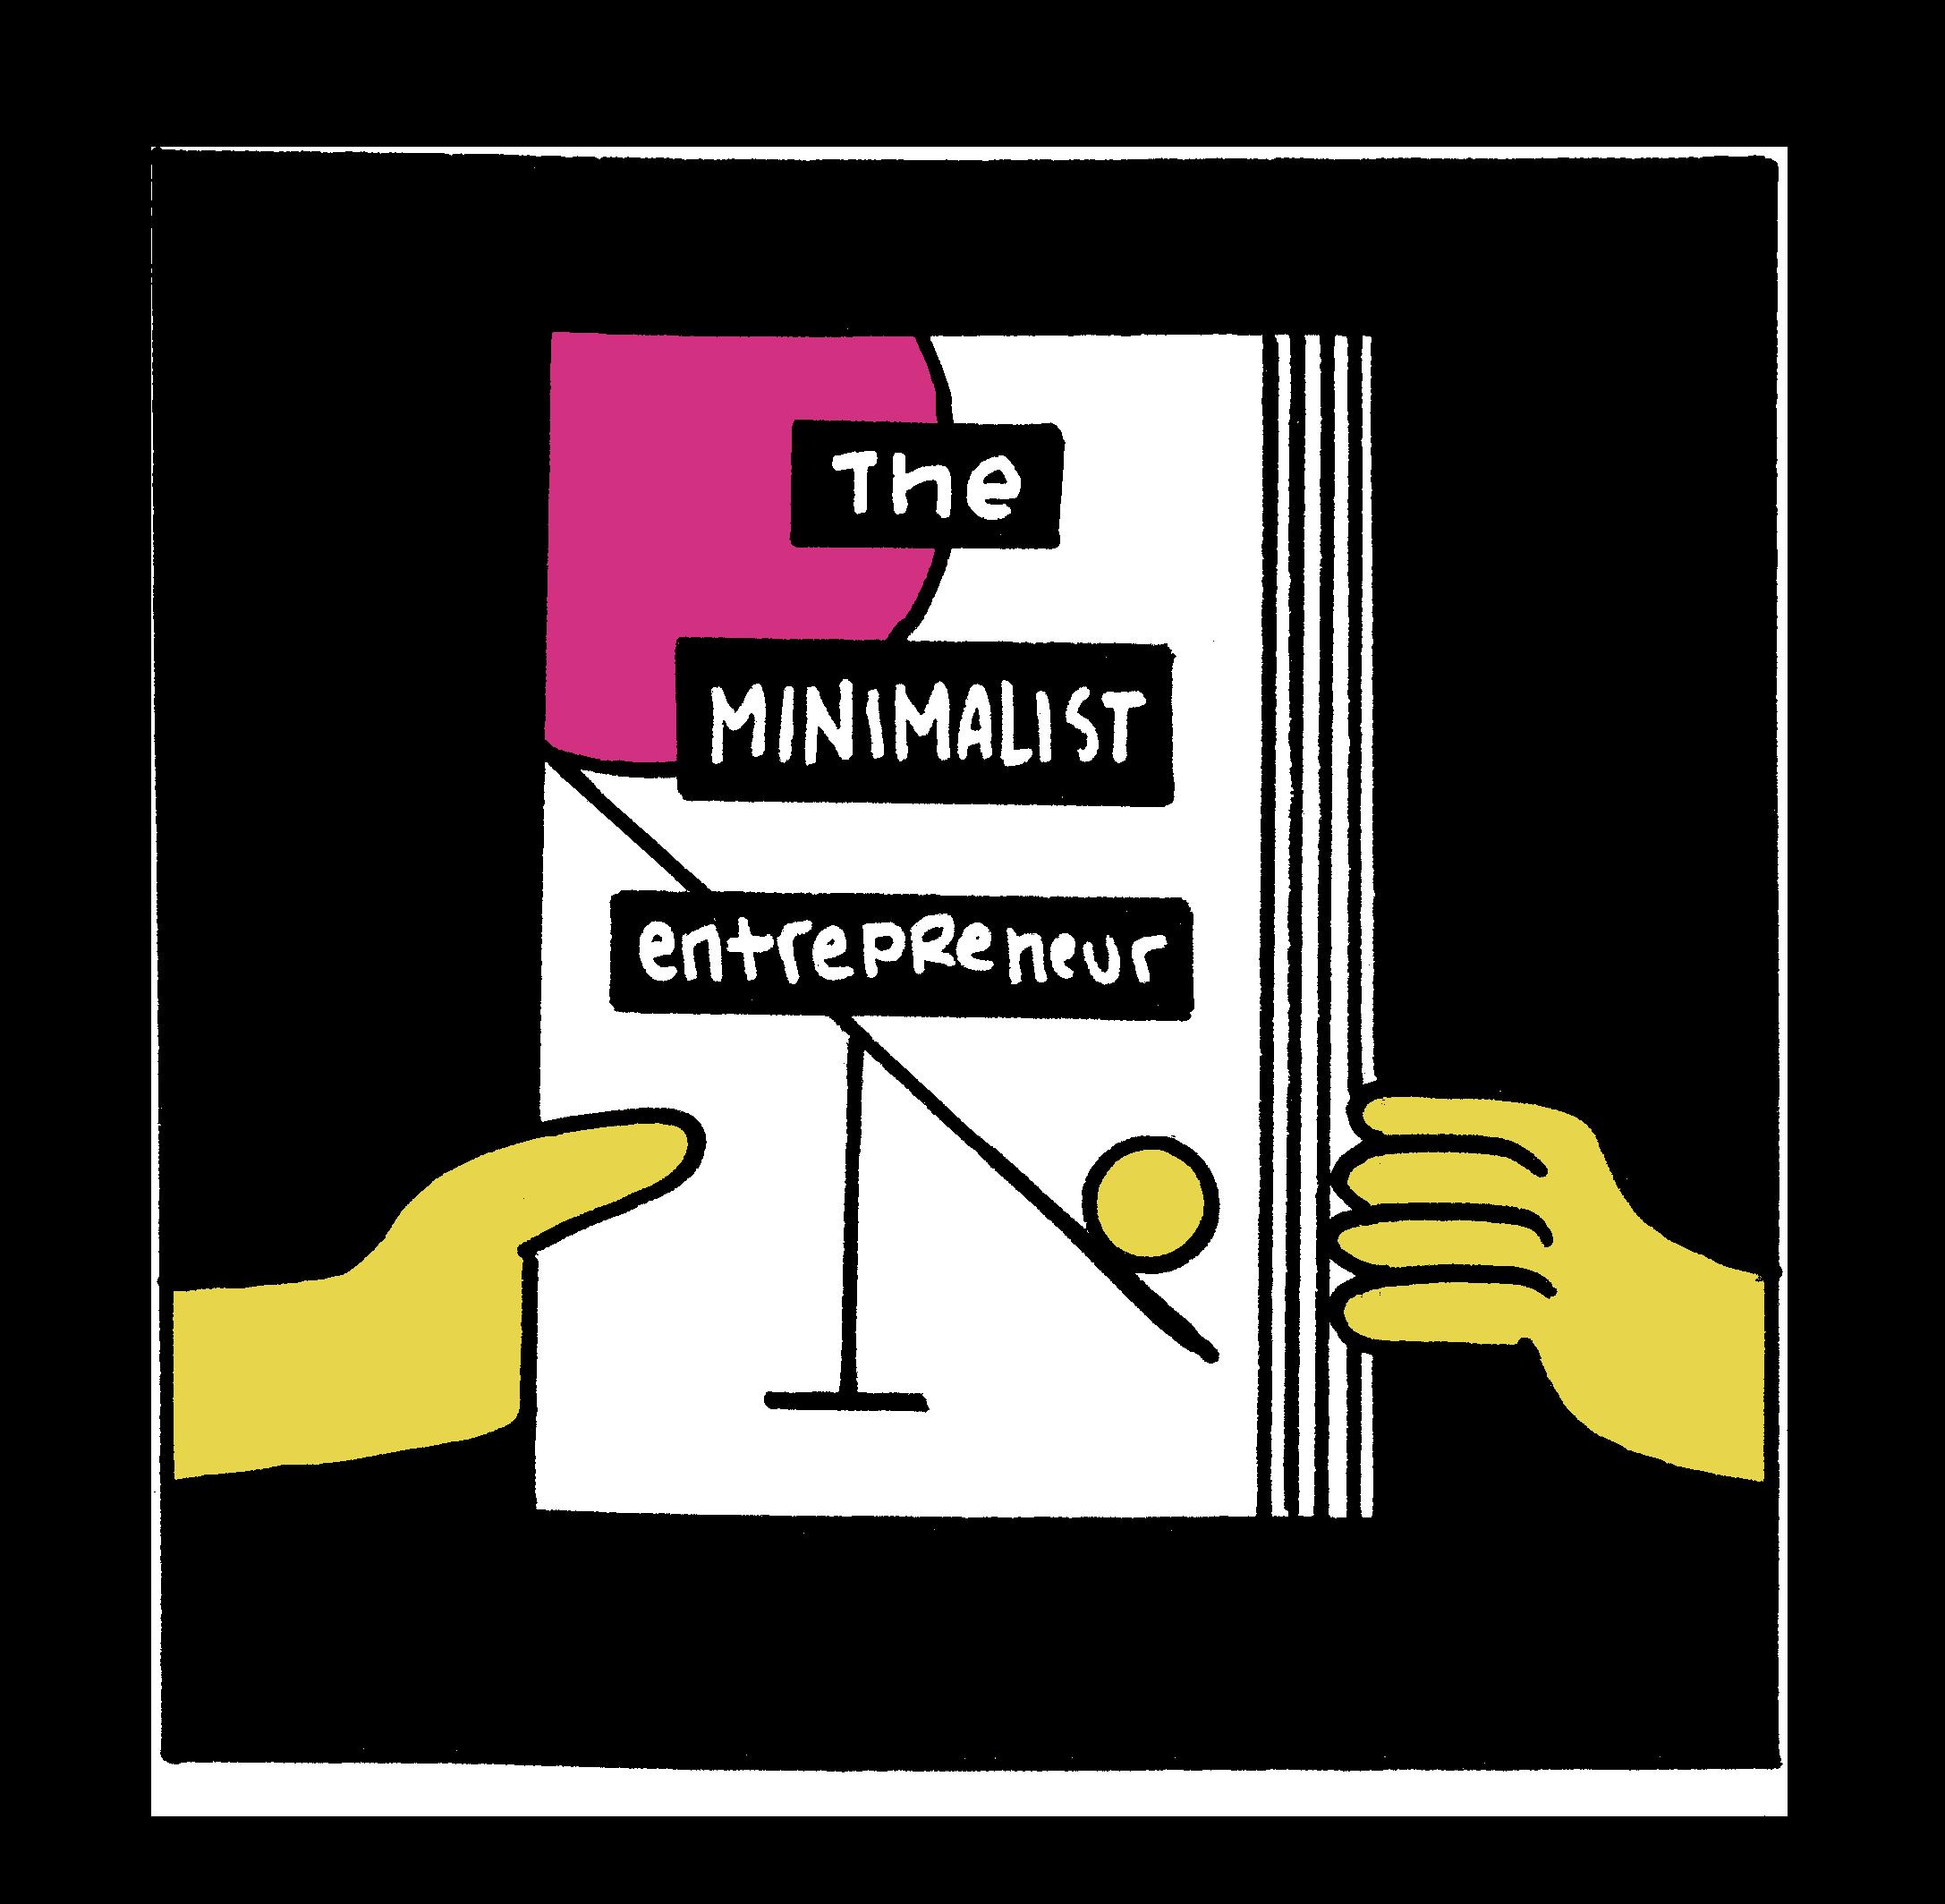 Illustration of The Minimalist Entrepreneur book